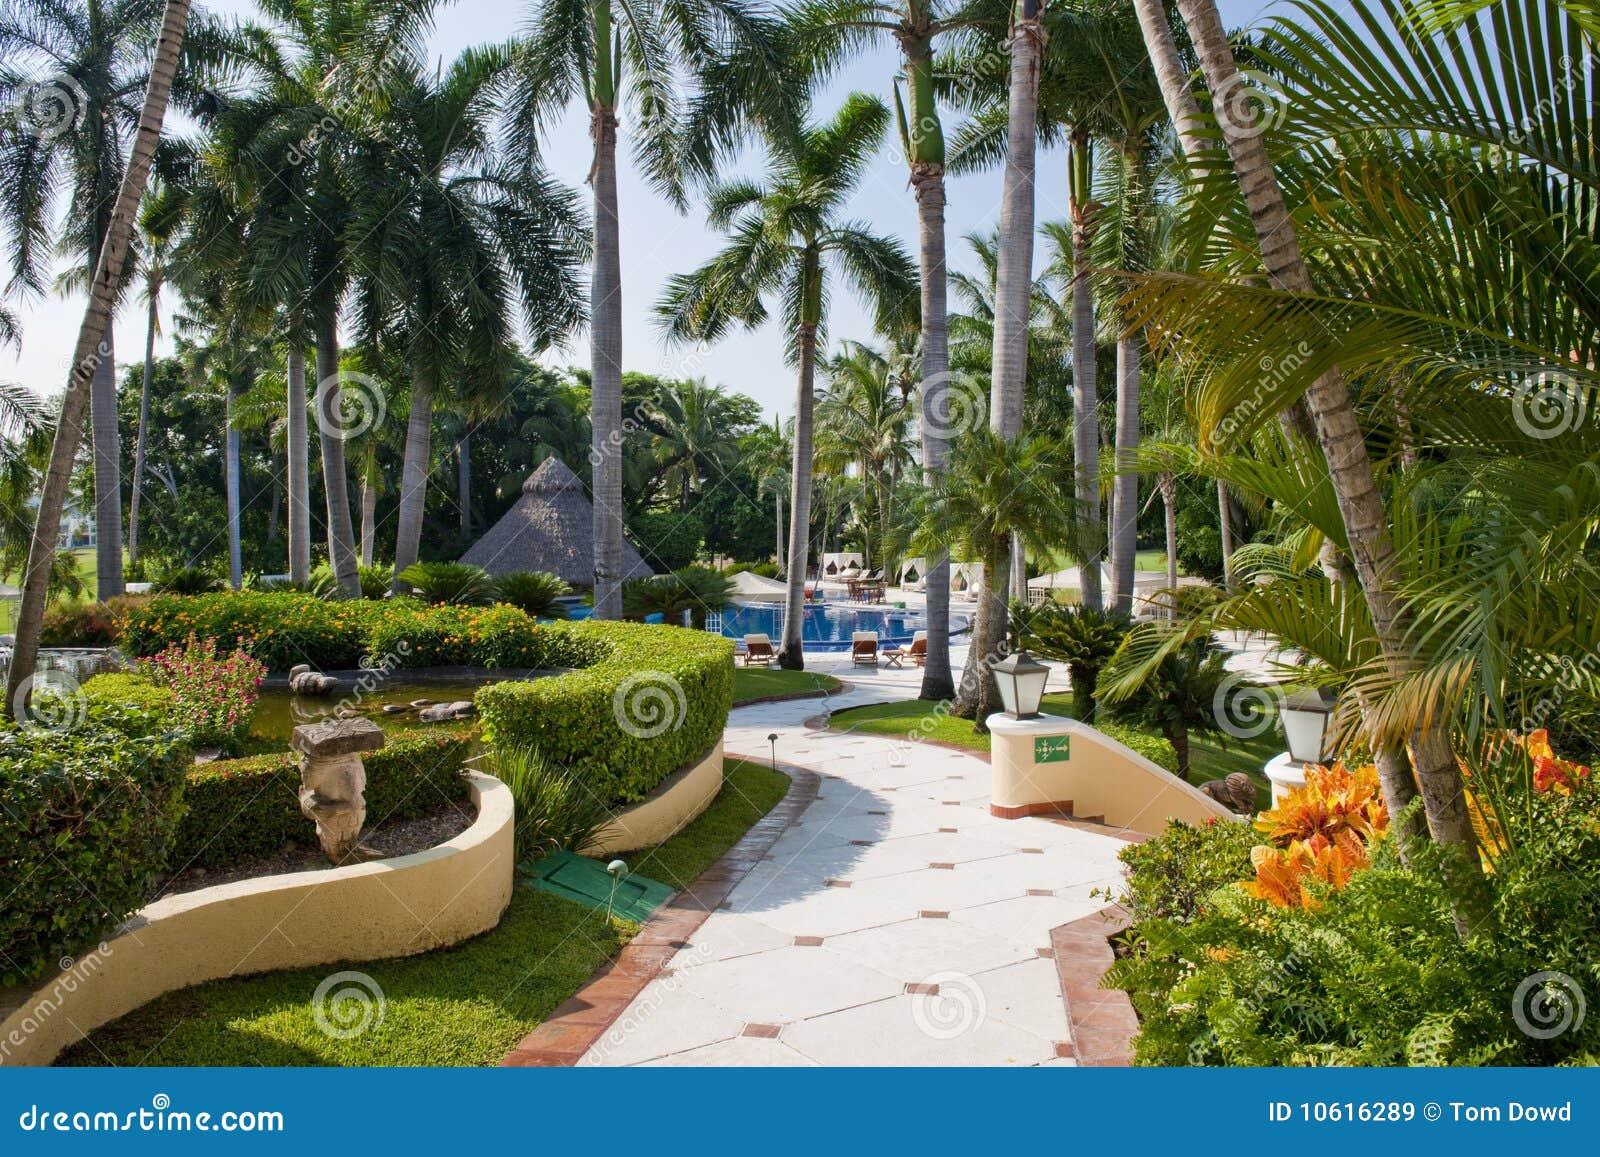 fotos jardins tropicais : fotos jardins tropicais:Jardins Tropicais Ajardinados Imagens de Stock Royalty Free – Imagem